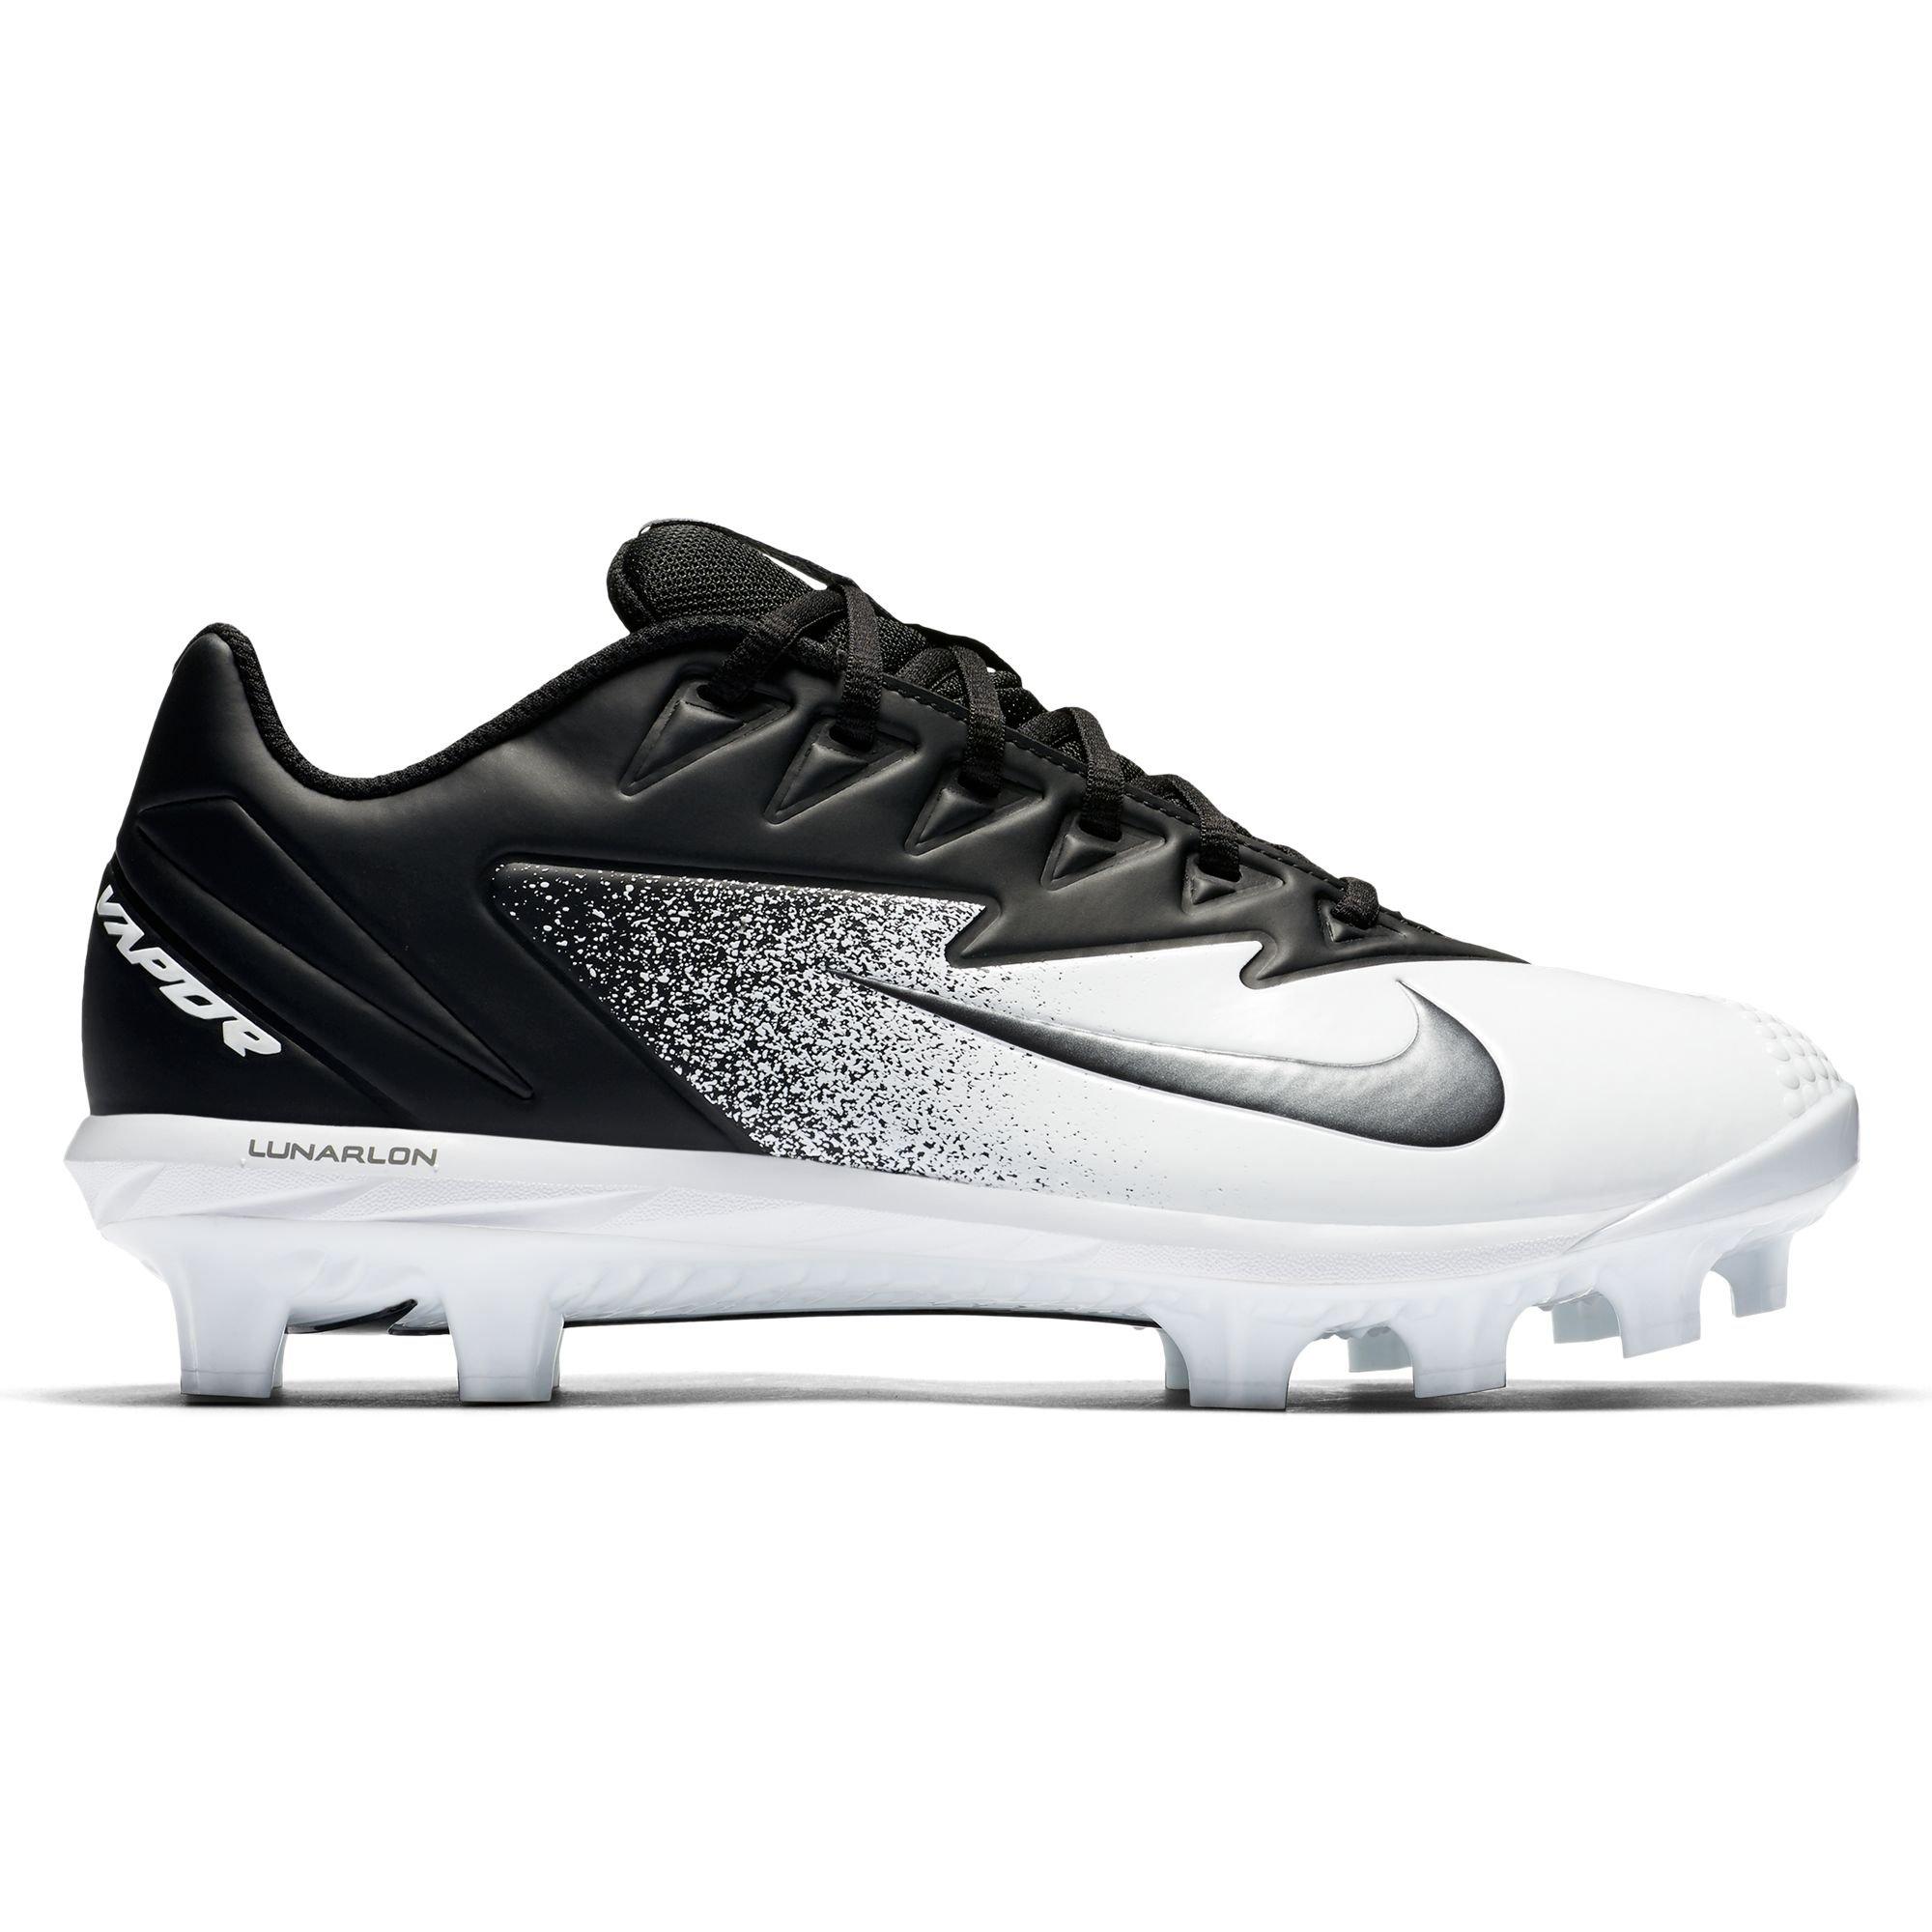 451476e51 Galleon - NIKE Men s Vapor Ultrafly Pro MCS Baseball Cleat Black Metallic  Silver White Size 7.5 D US